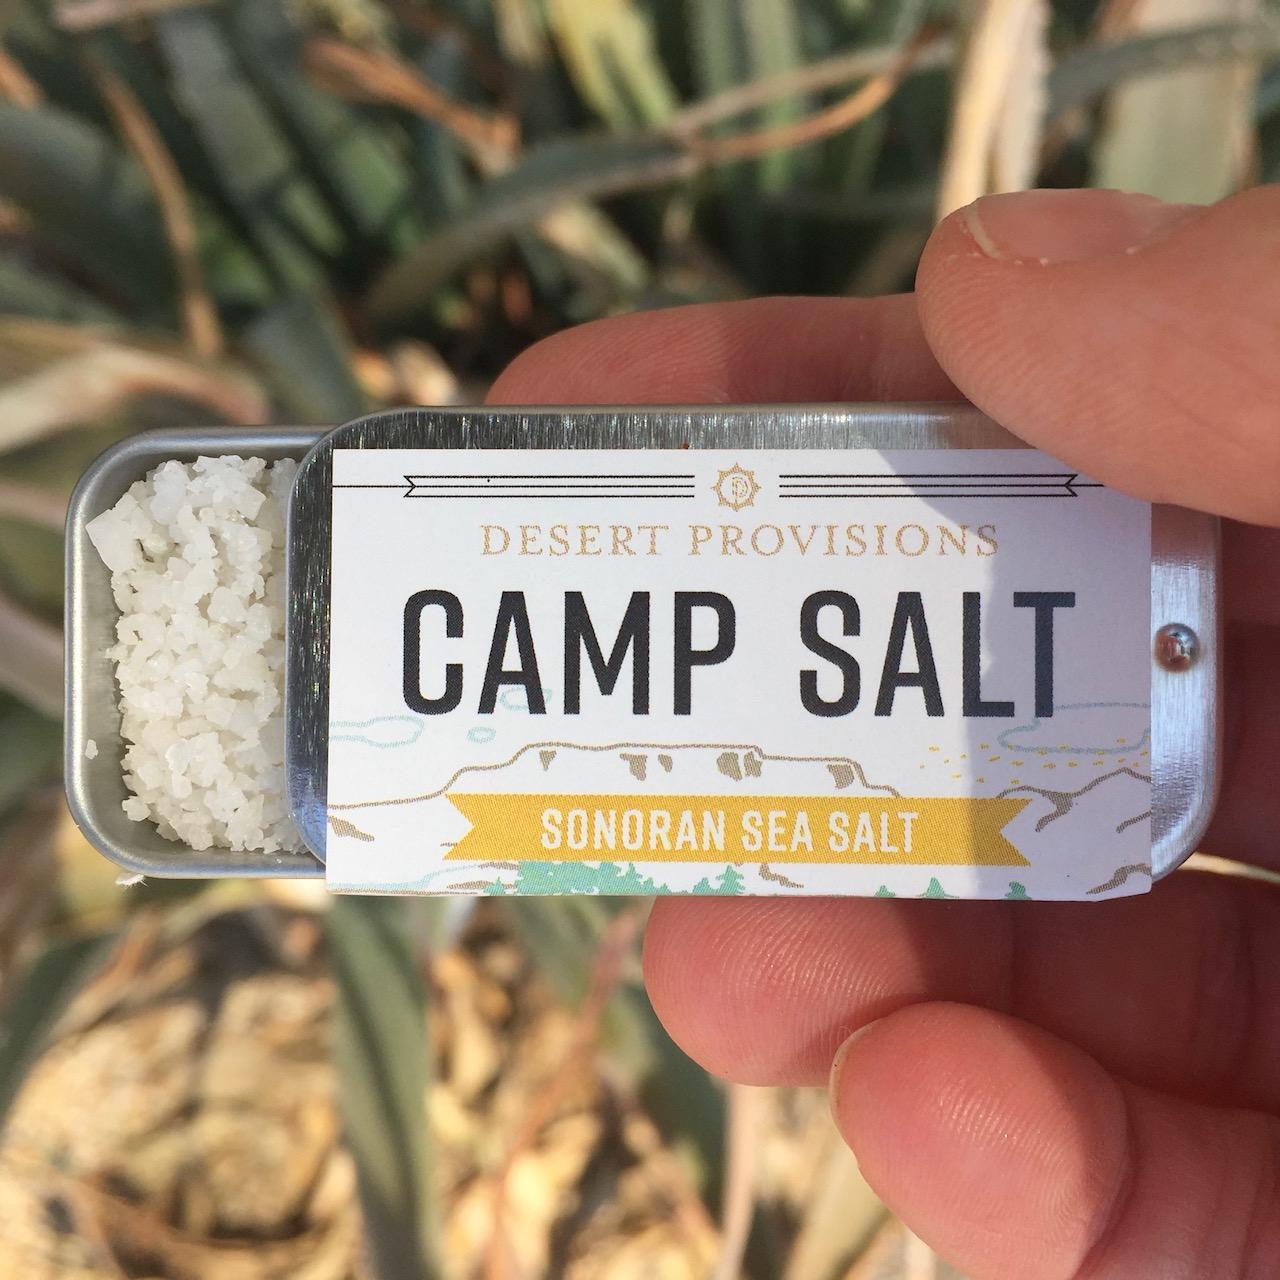 Desert Provisions Camp Salt.jpg